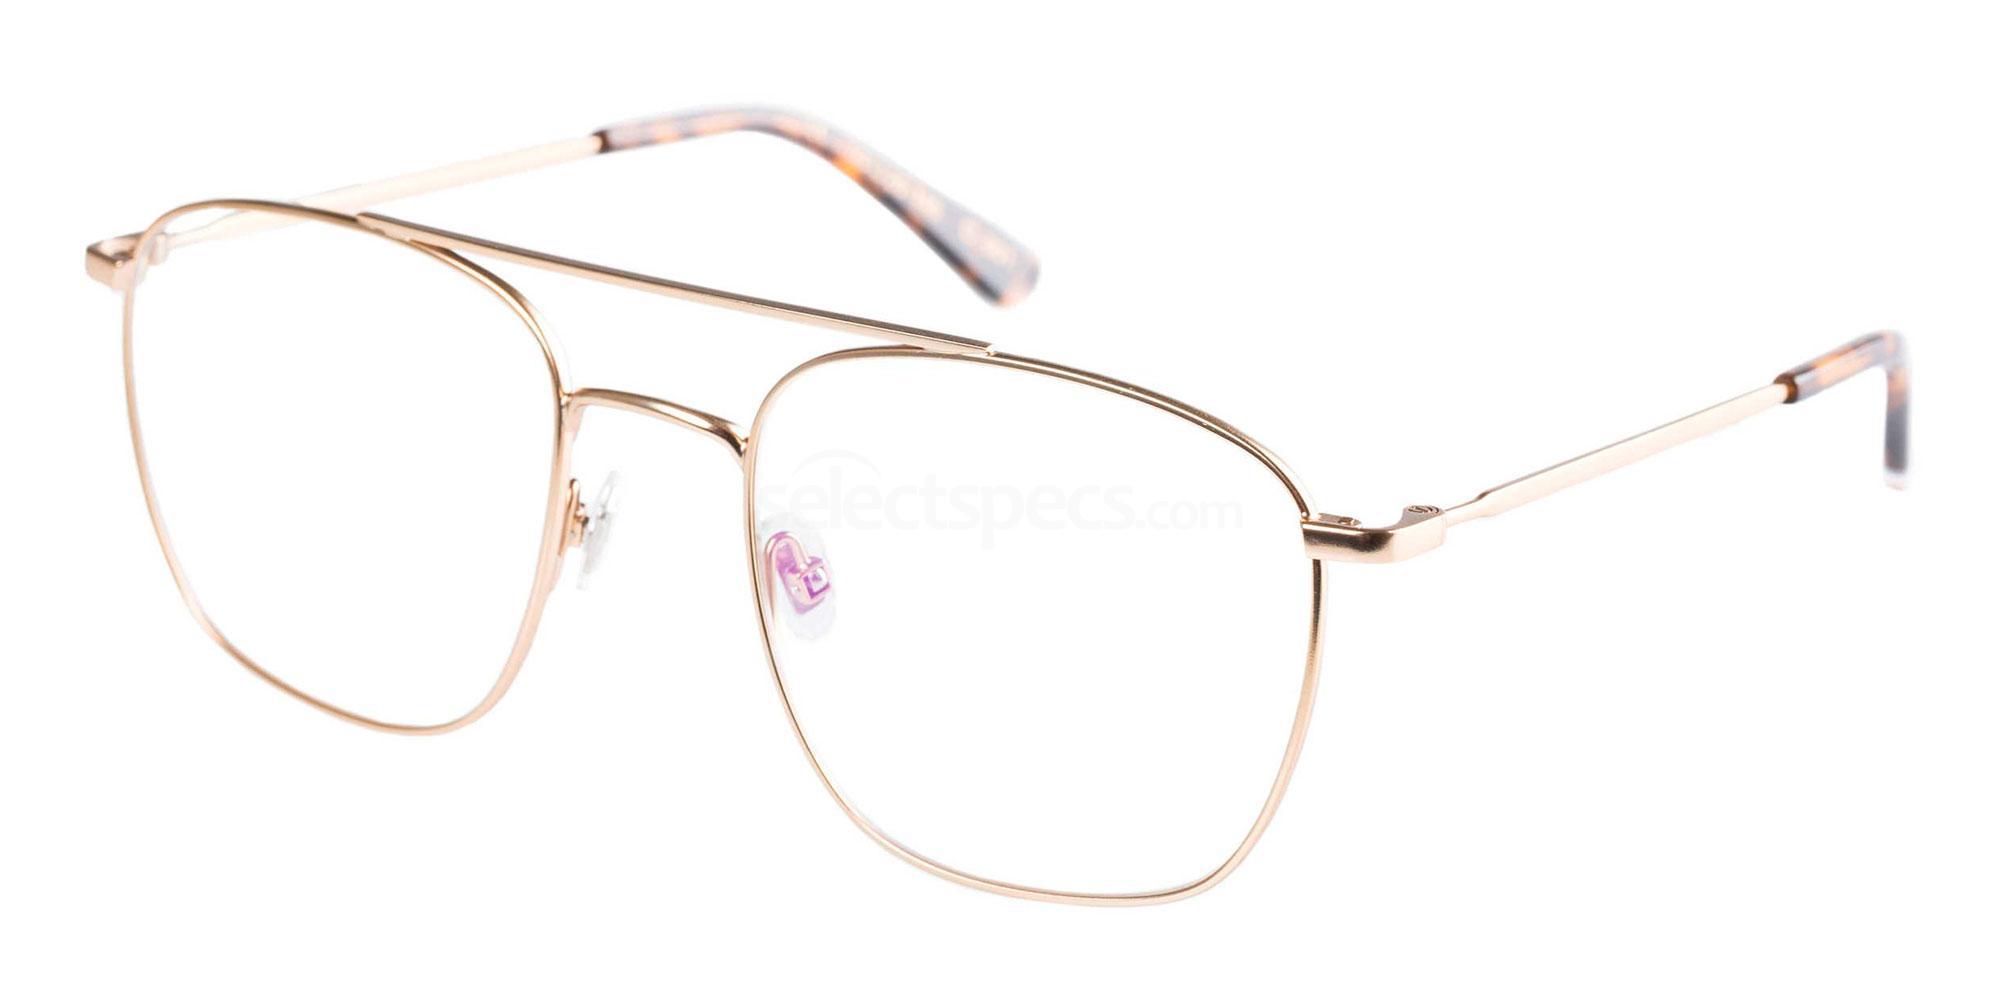 001 SDO-KARE Glasses, Superdry